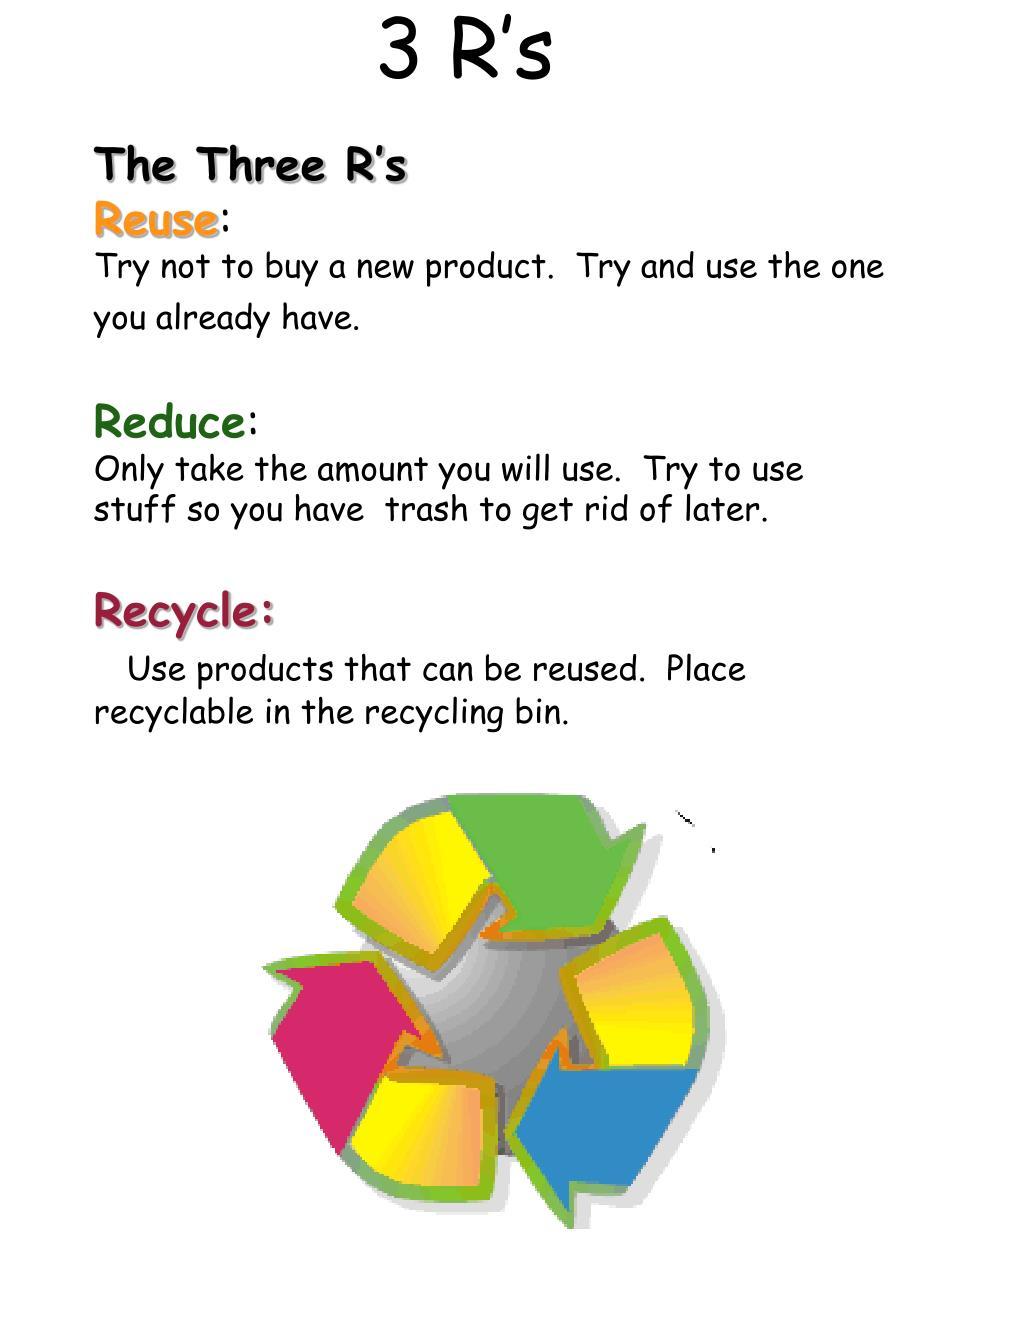 3 R's